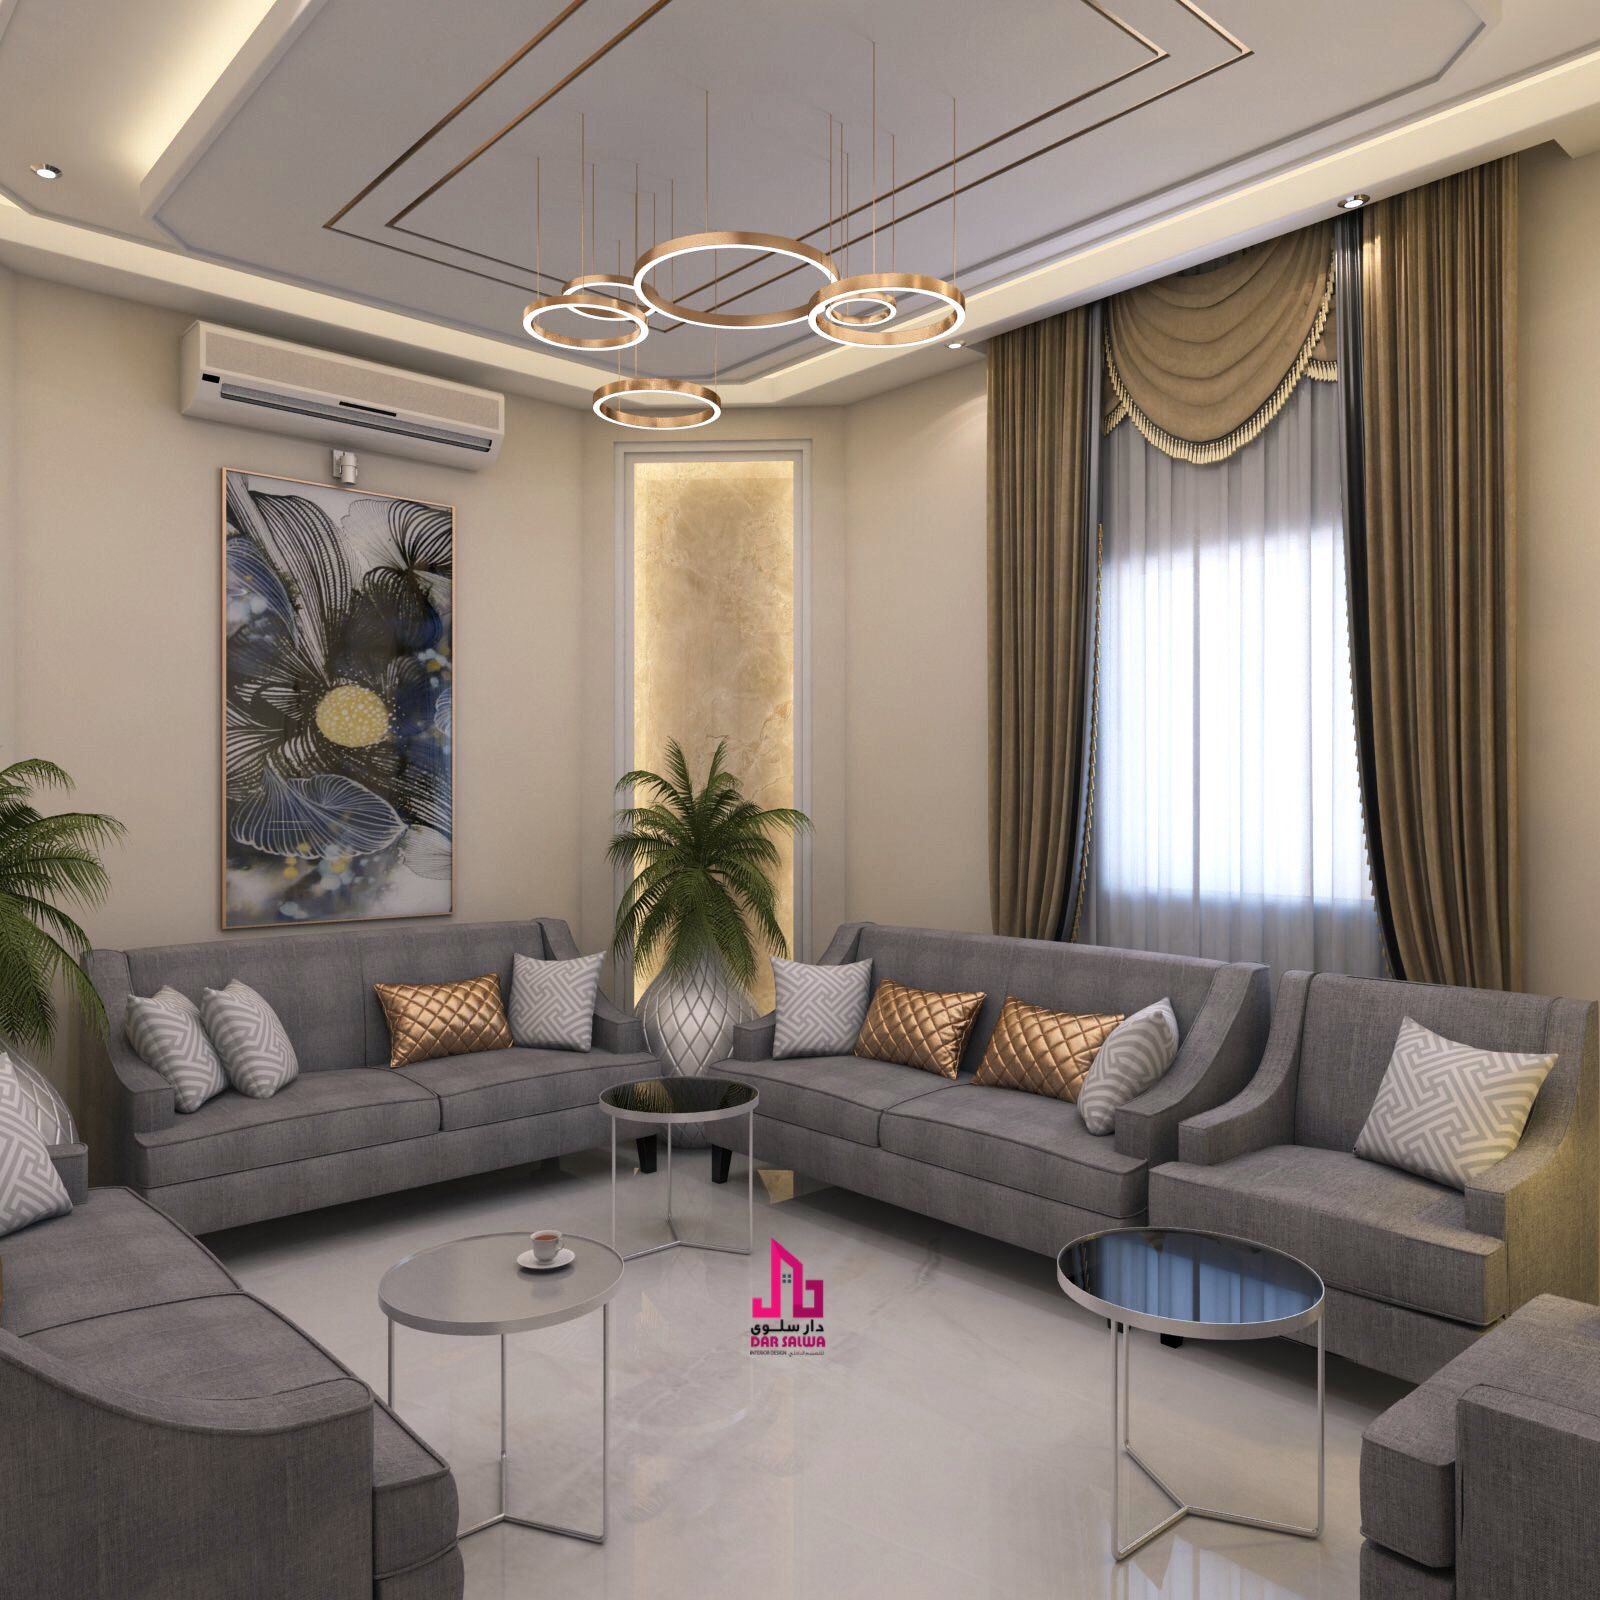 Dar Salwa تصميم ديكور On Twitter Living Room Decor Apartment Furniture Design Living Room Home Design Living Room